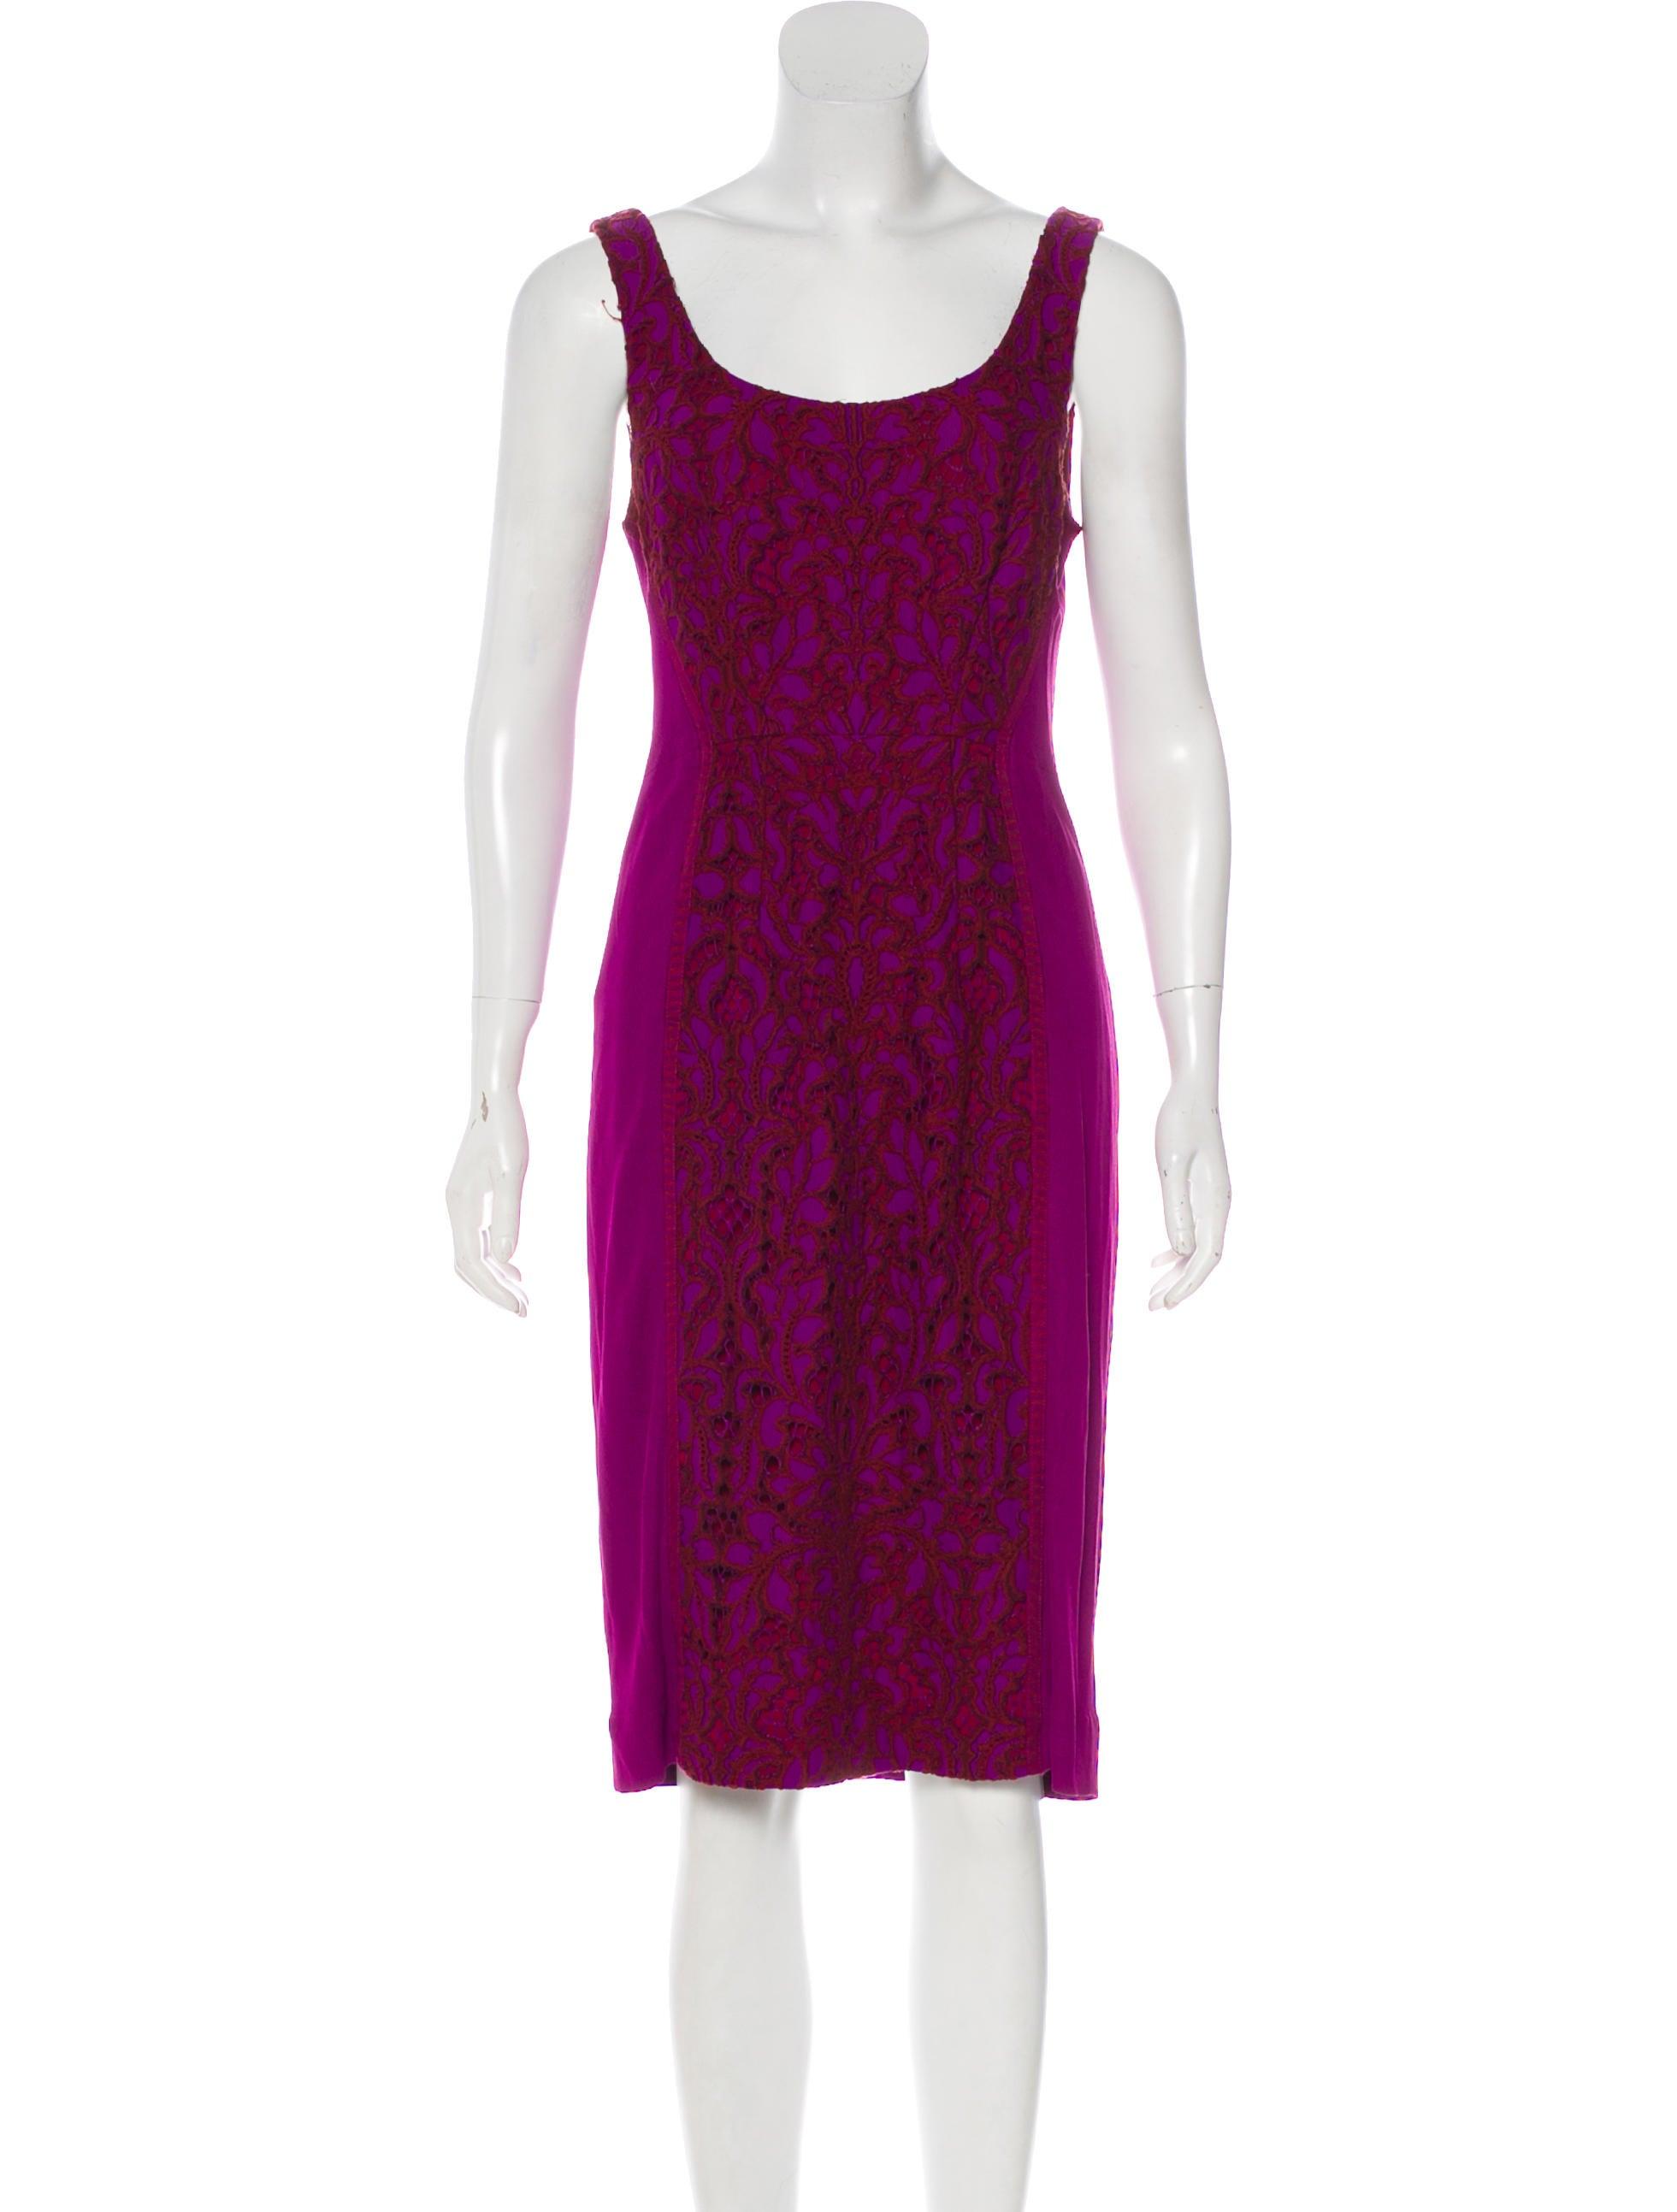 ab87f68c5957f Diane von Furstenberg Lace Knee-Length Dress - Clothing - WDI141739 ...